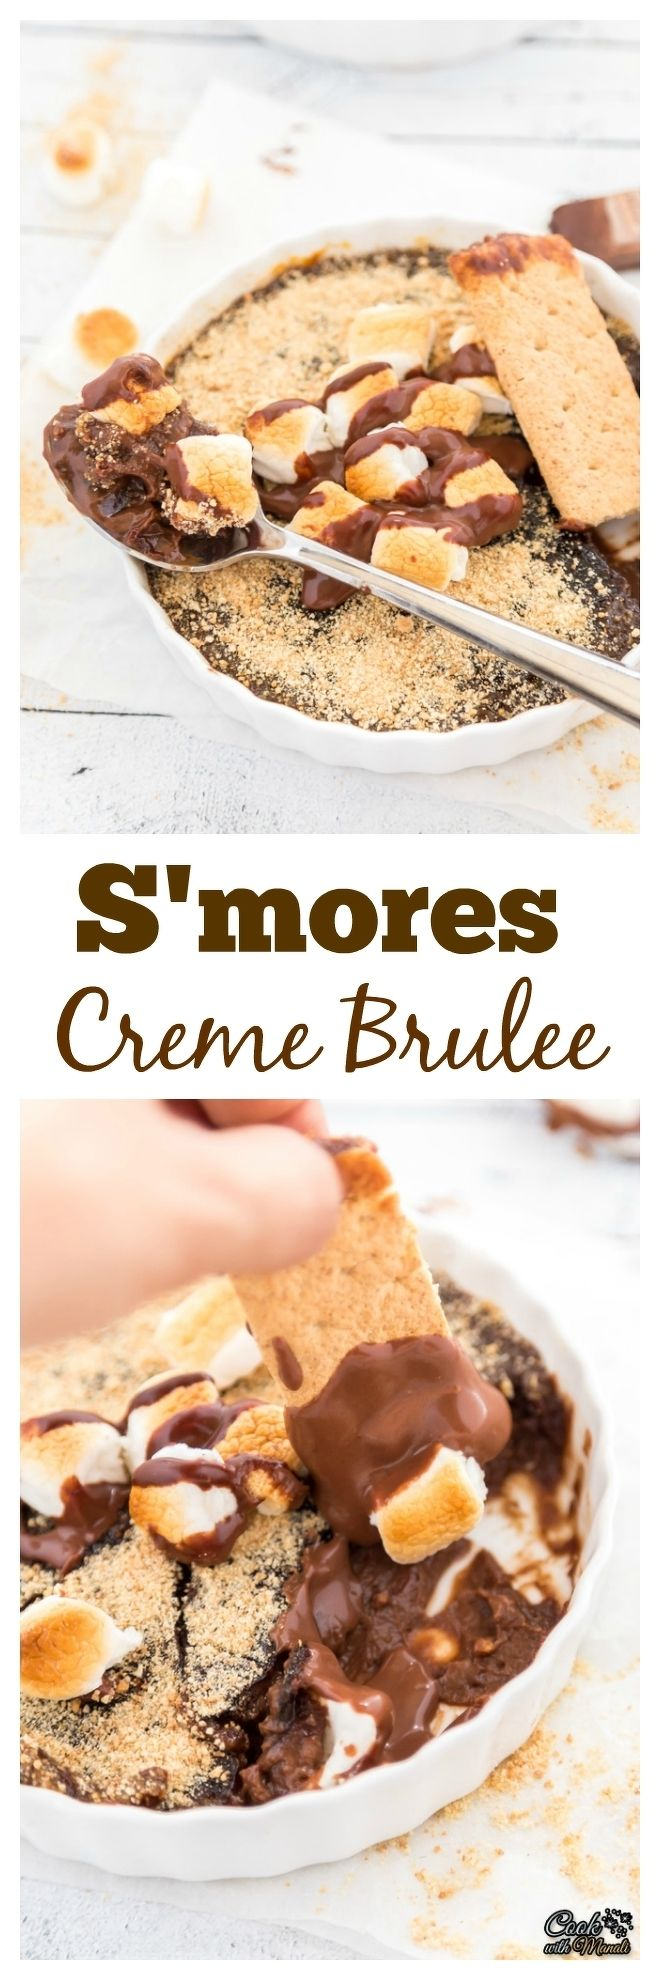 S'mores Creme Brulee Collage-nocwm